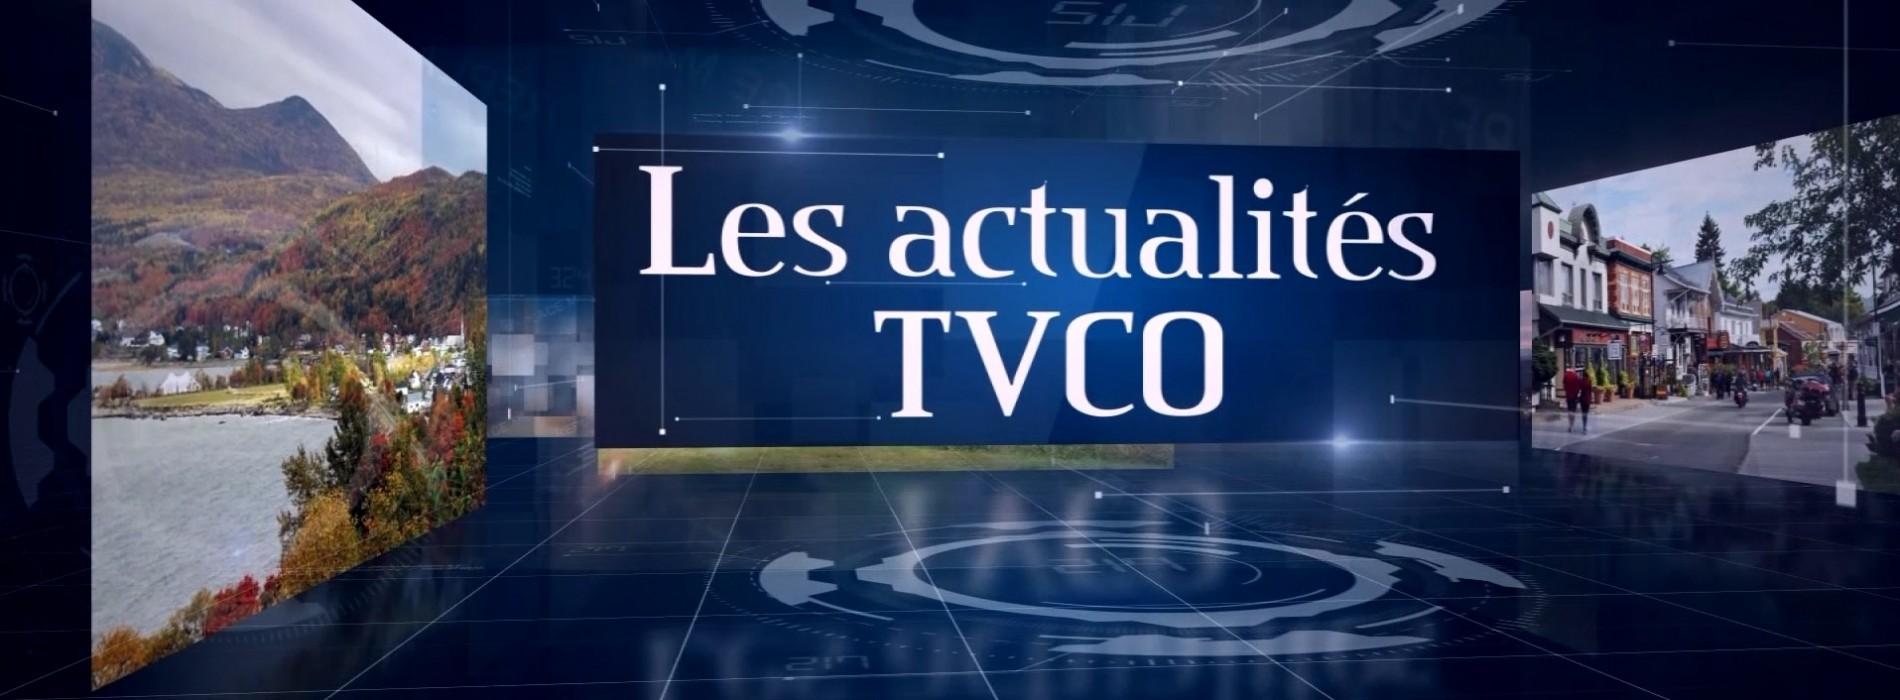 actualites-tvco